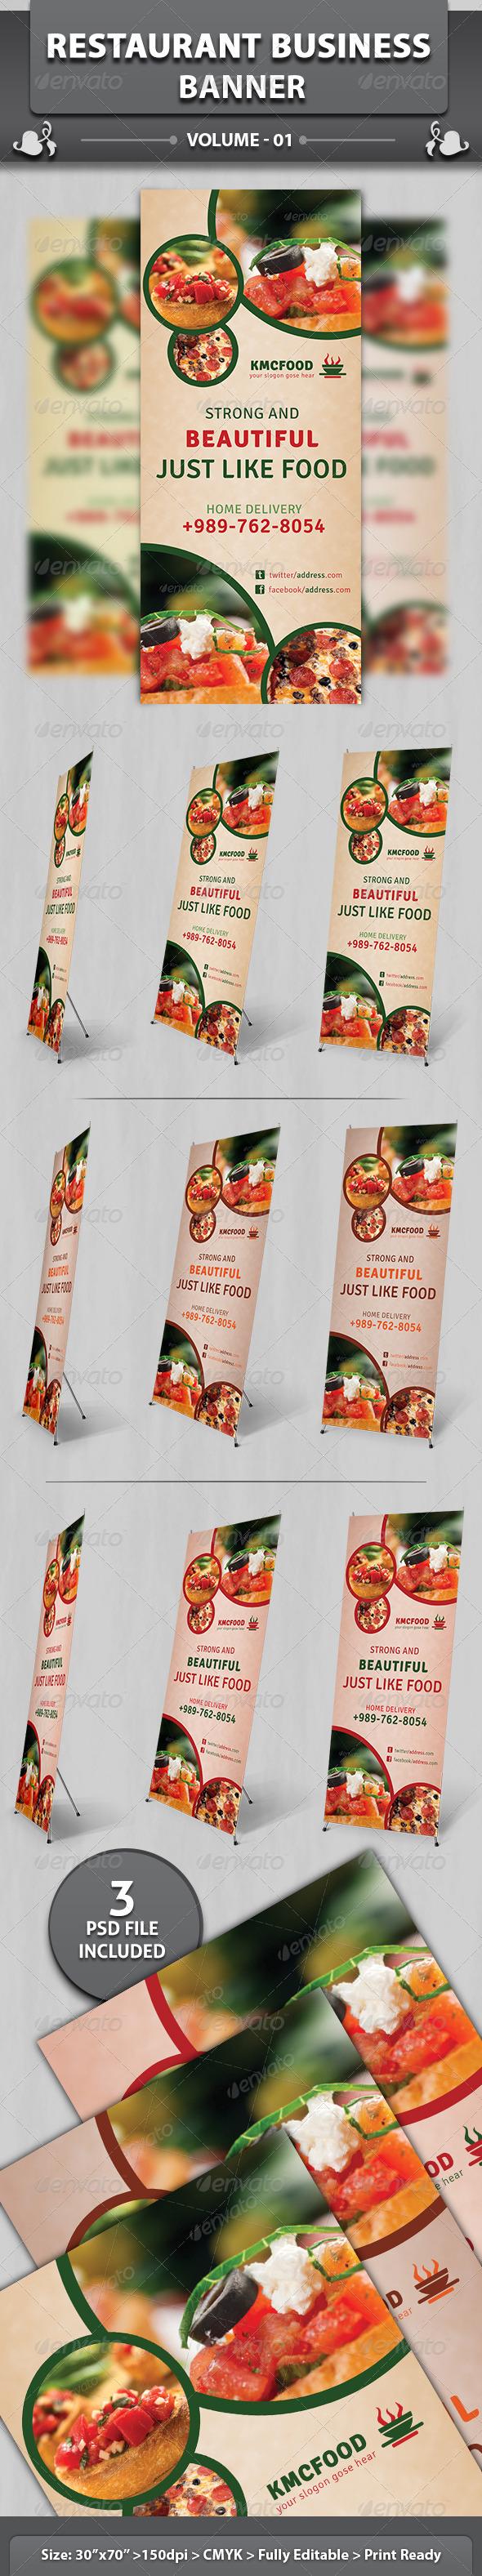 Restaurant Business Banner   Volume 14 - Signage Print Templates